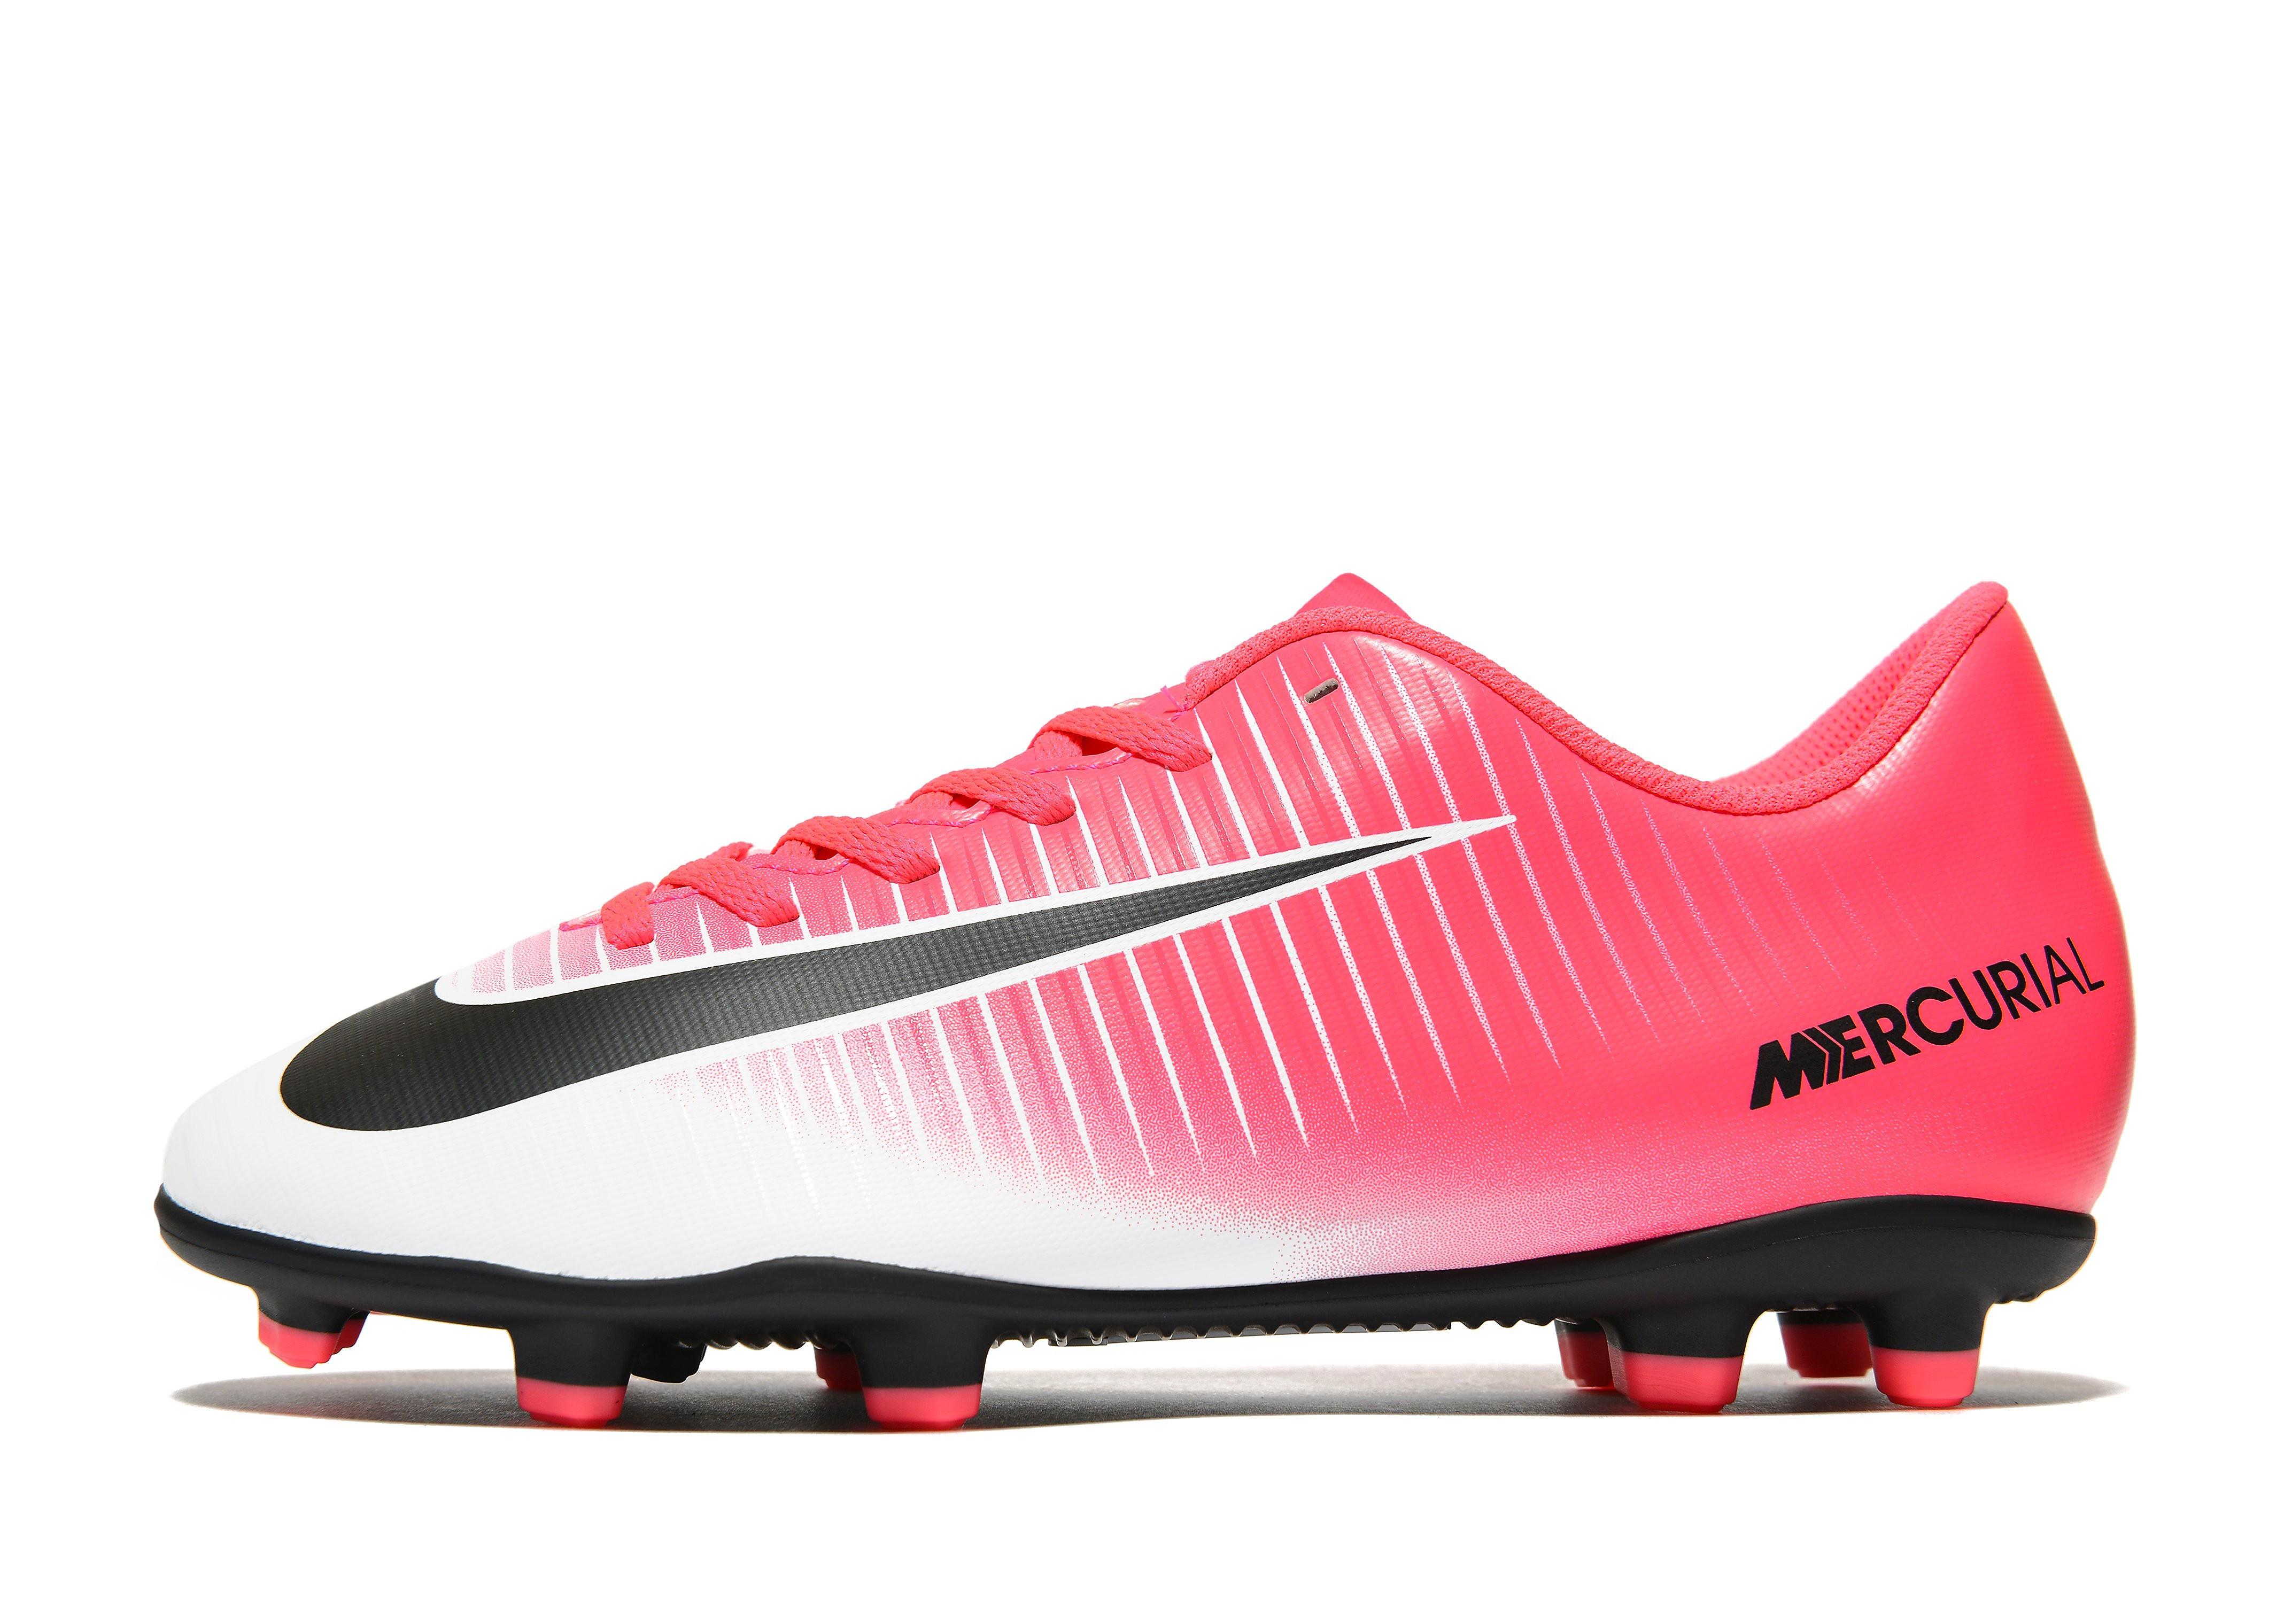 Nike Motion Blur Mercurial Vortex Junior FG Football Boots